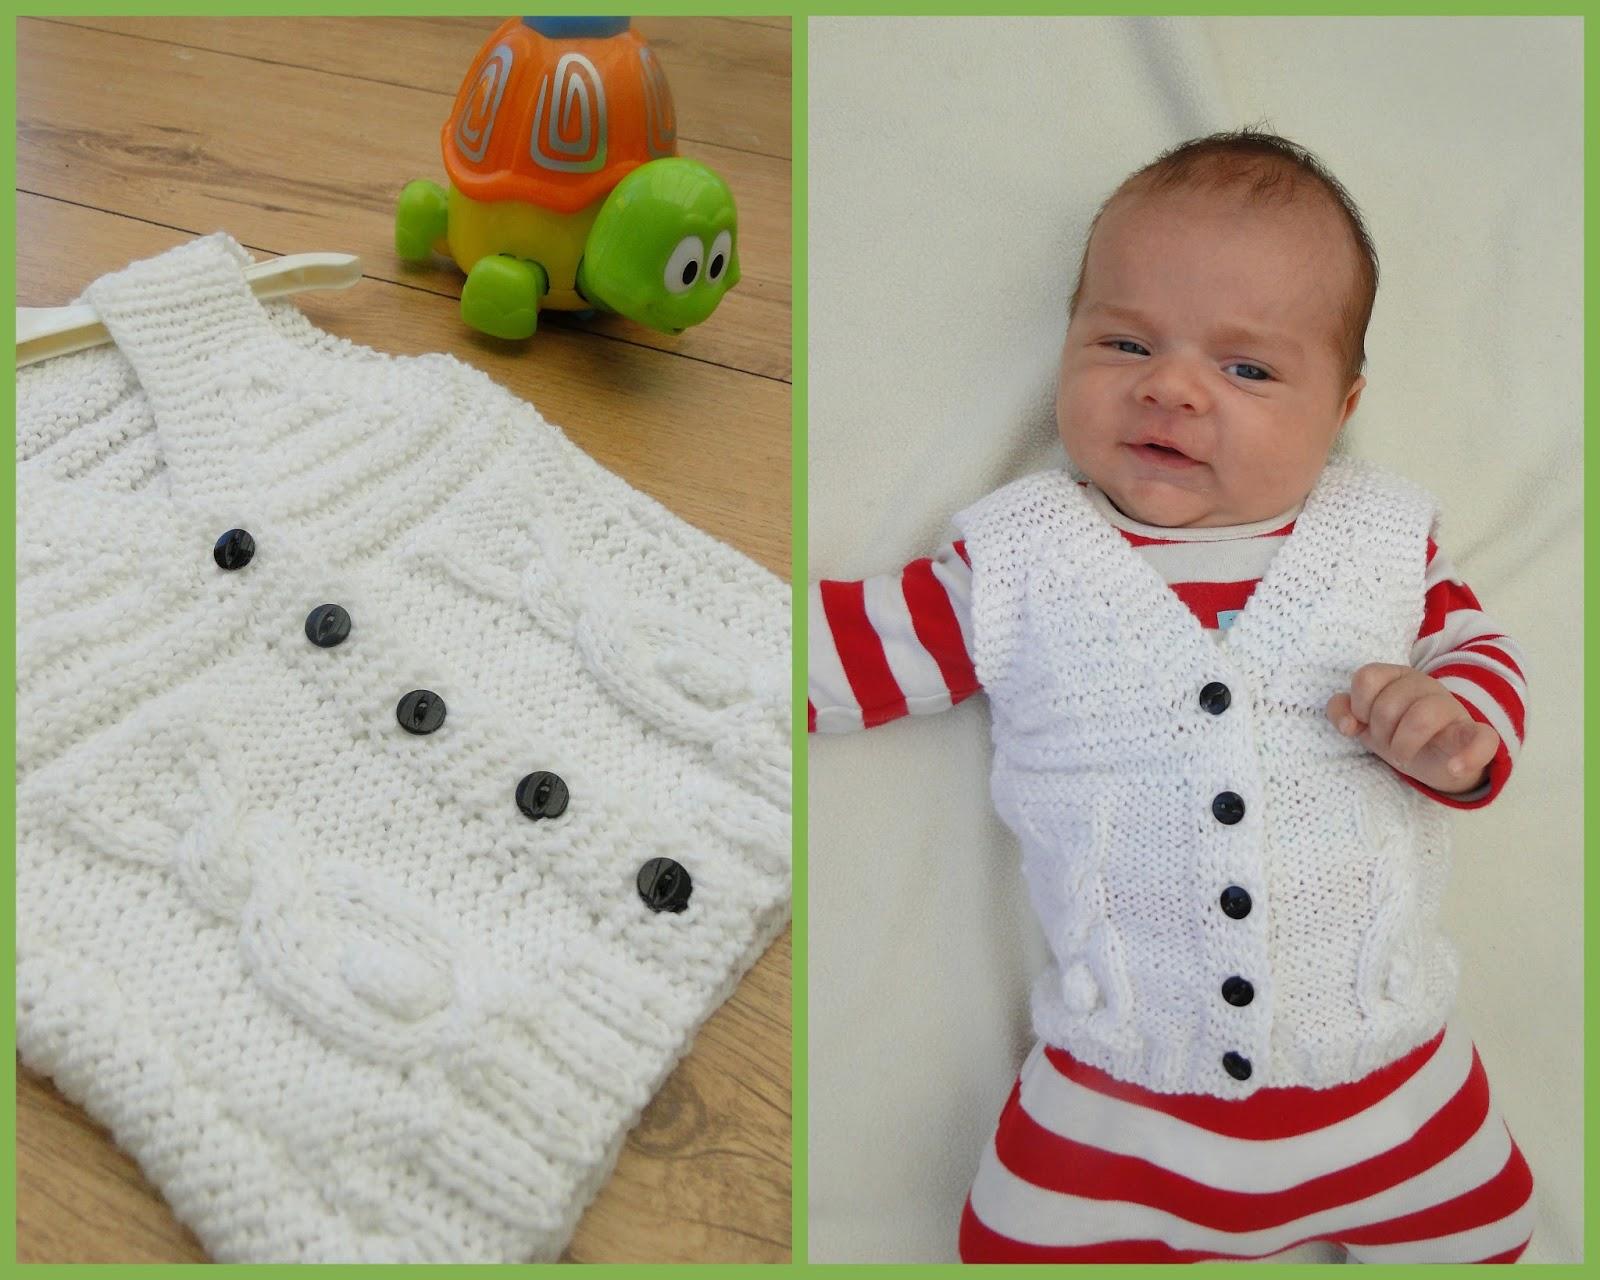 3 Rabbits Patterns: Babies vest with Rabbits knitting pattern